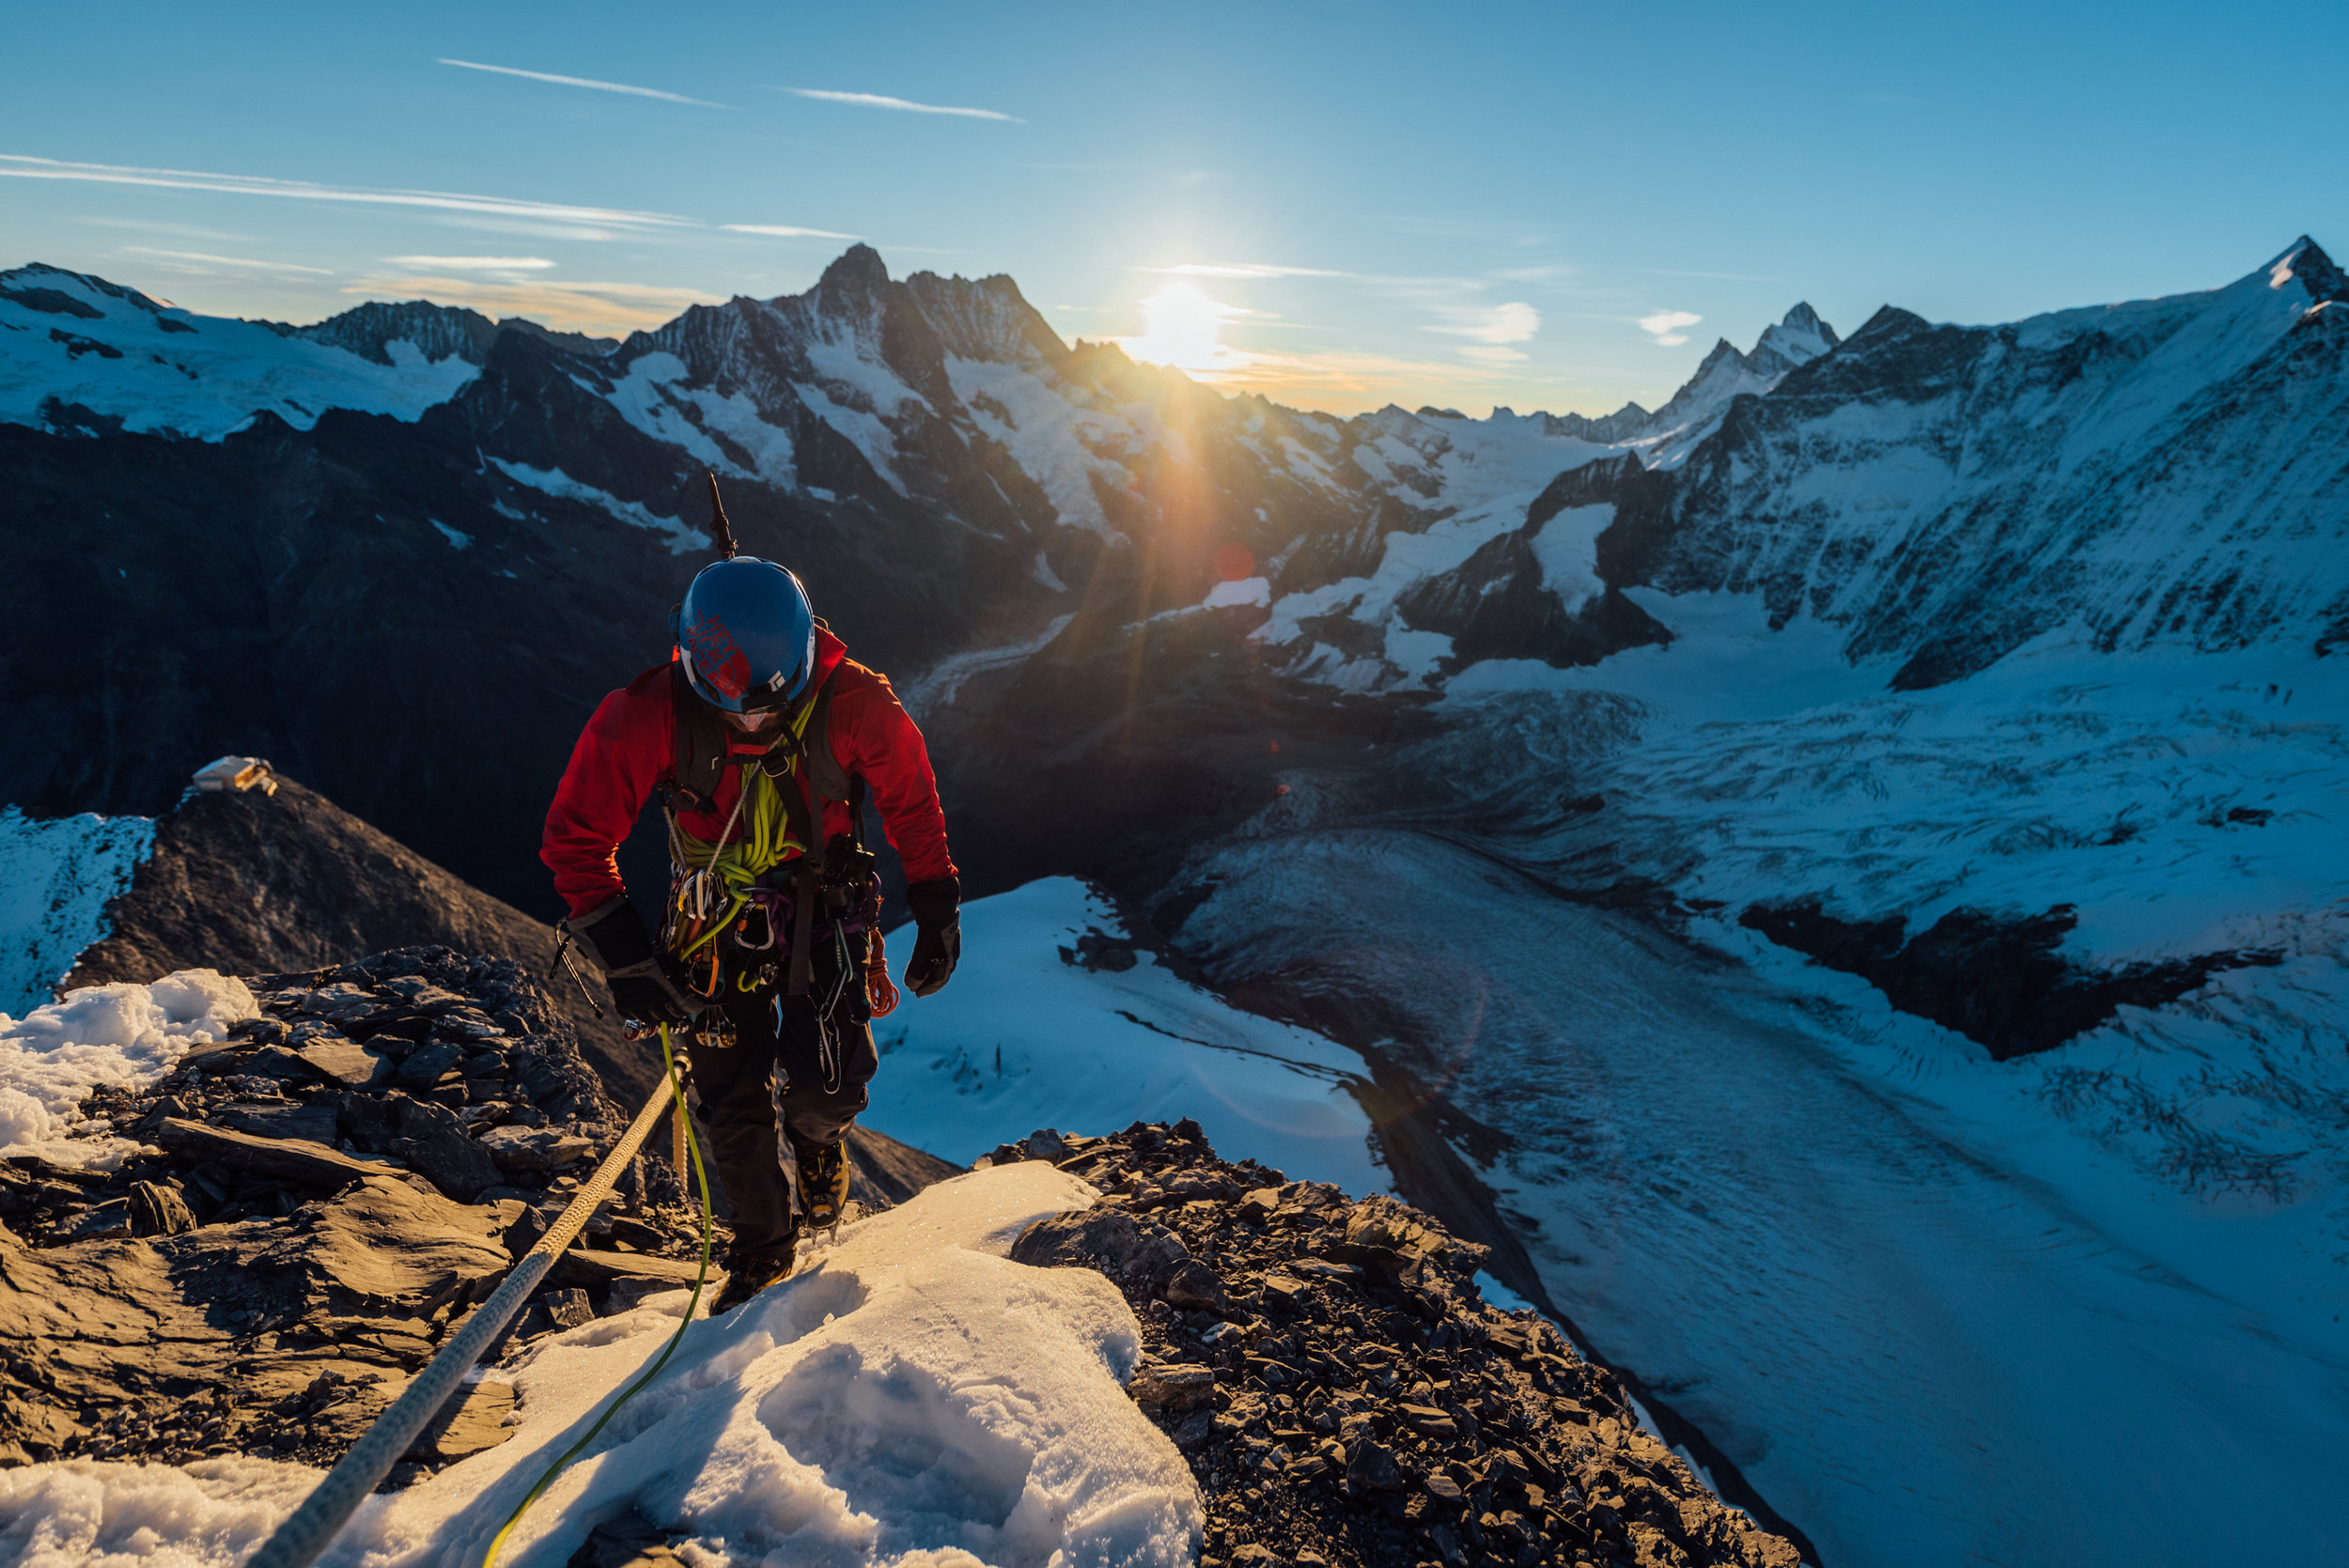 Alps-Fall2016-D750-11.jpg